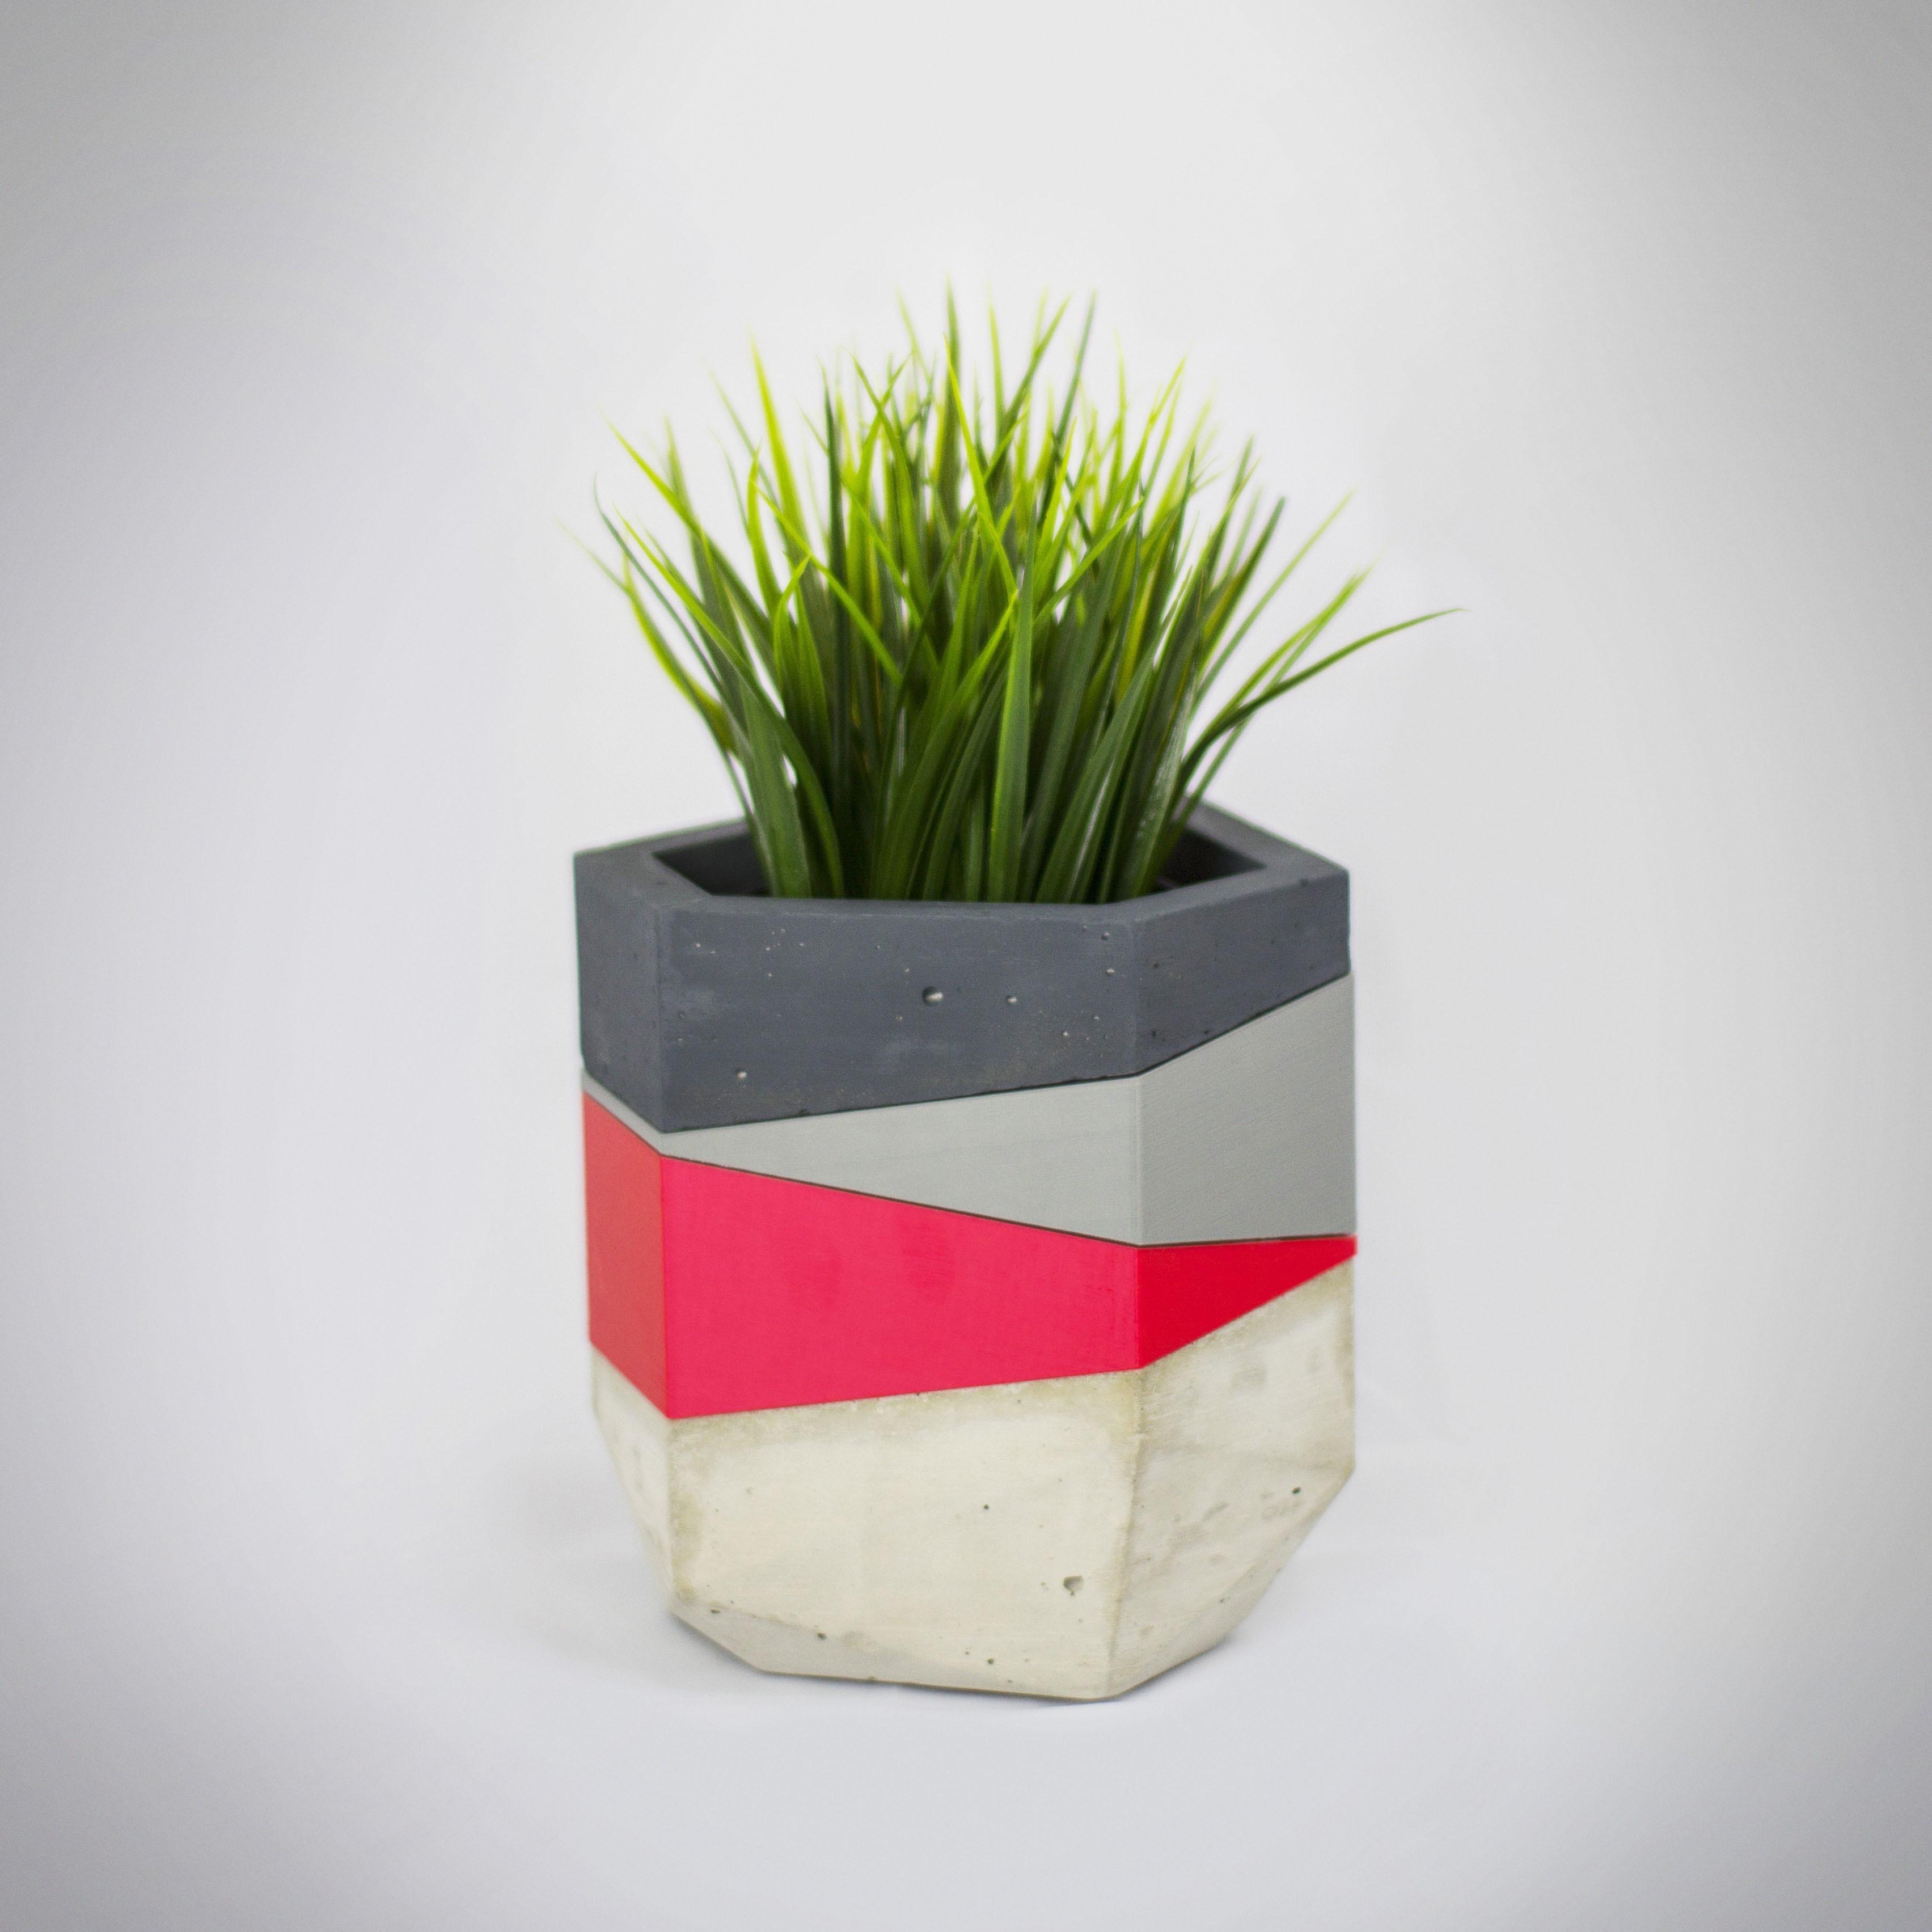 Macetero 2 insta.jpg Download free STL file Concrete Planters Mold • 3D print model, dukedoks